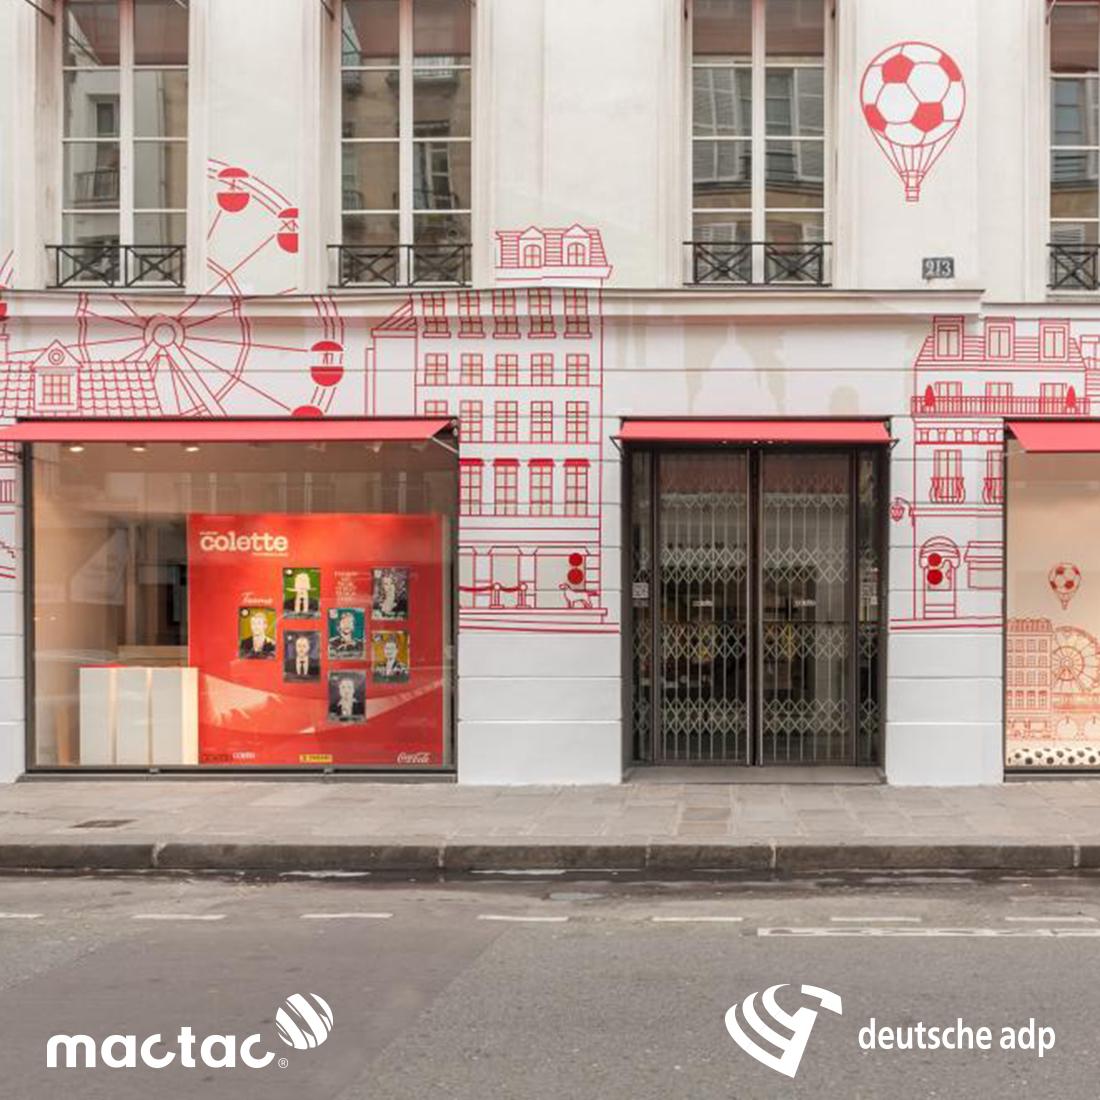 Mactac WW Dekorationsfolie